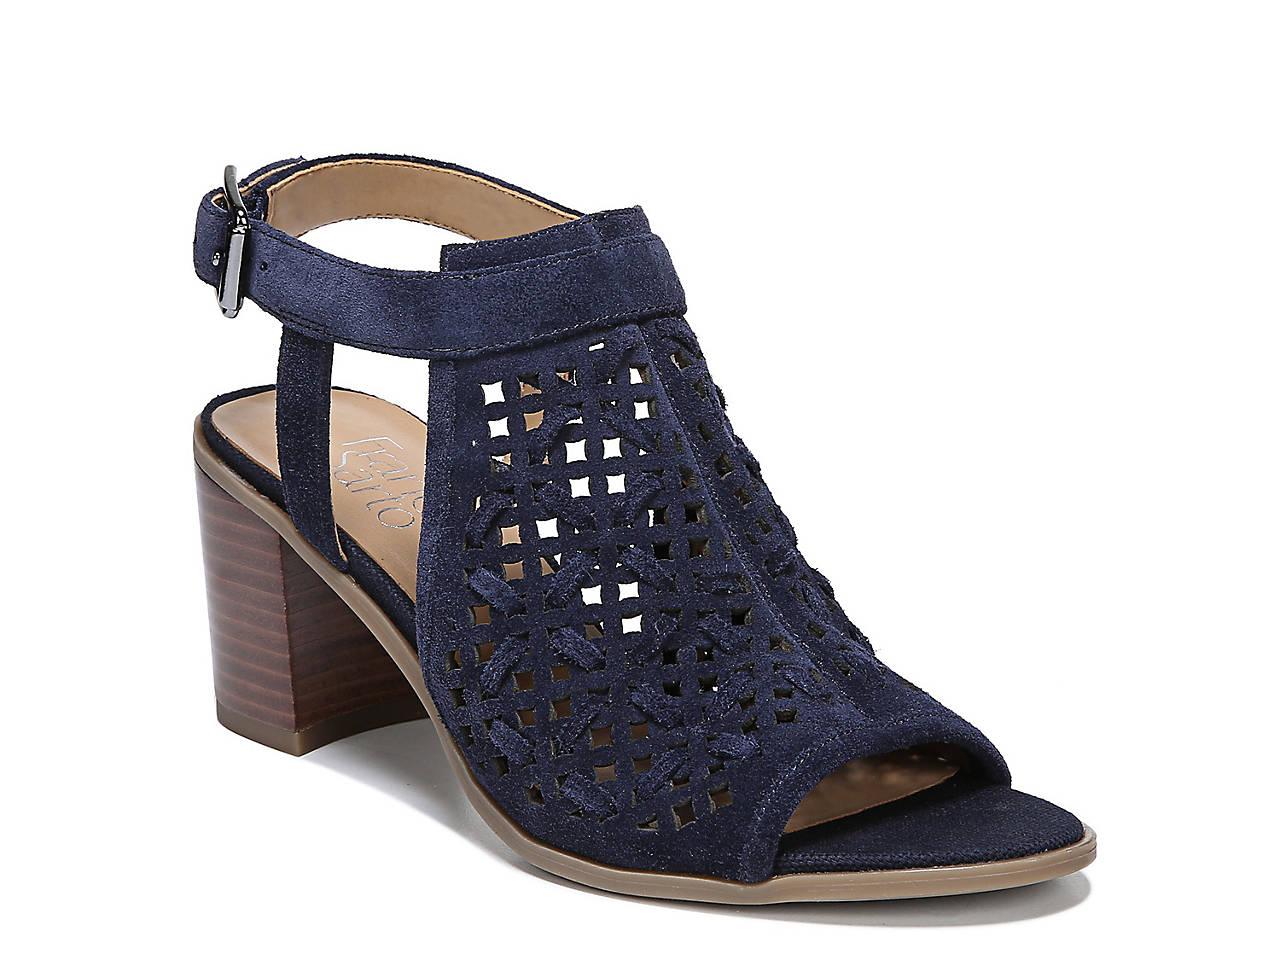 aac416cf93 Franco Sarto Harlet3 Sandal Women s Shoes